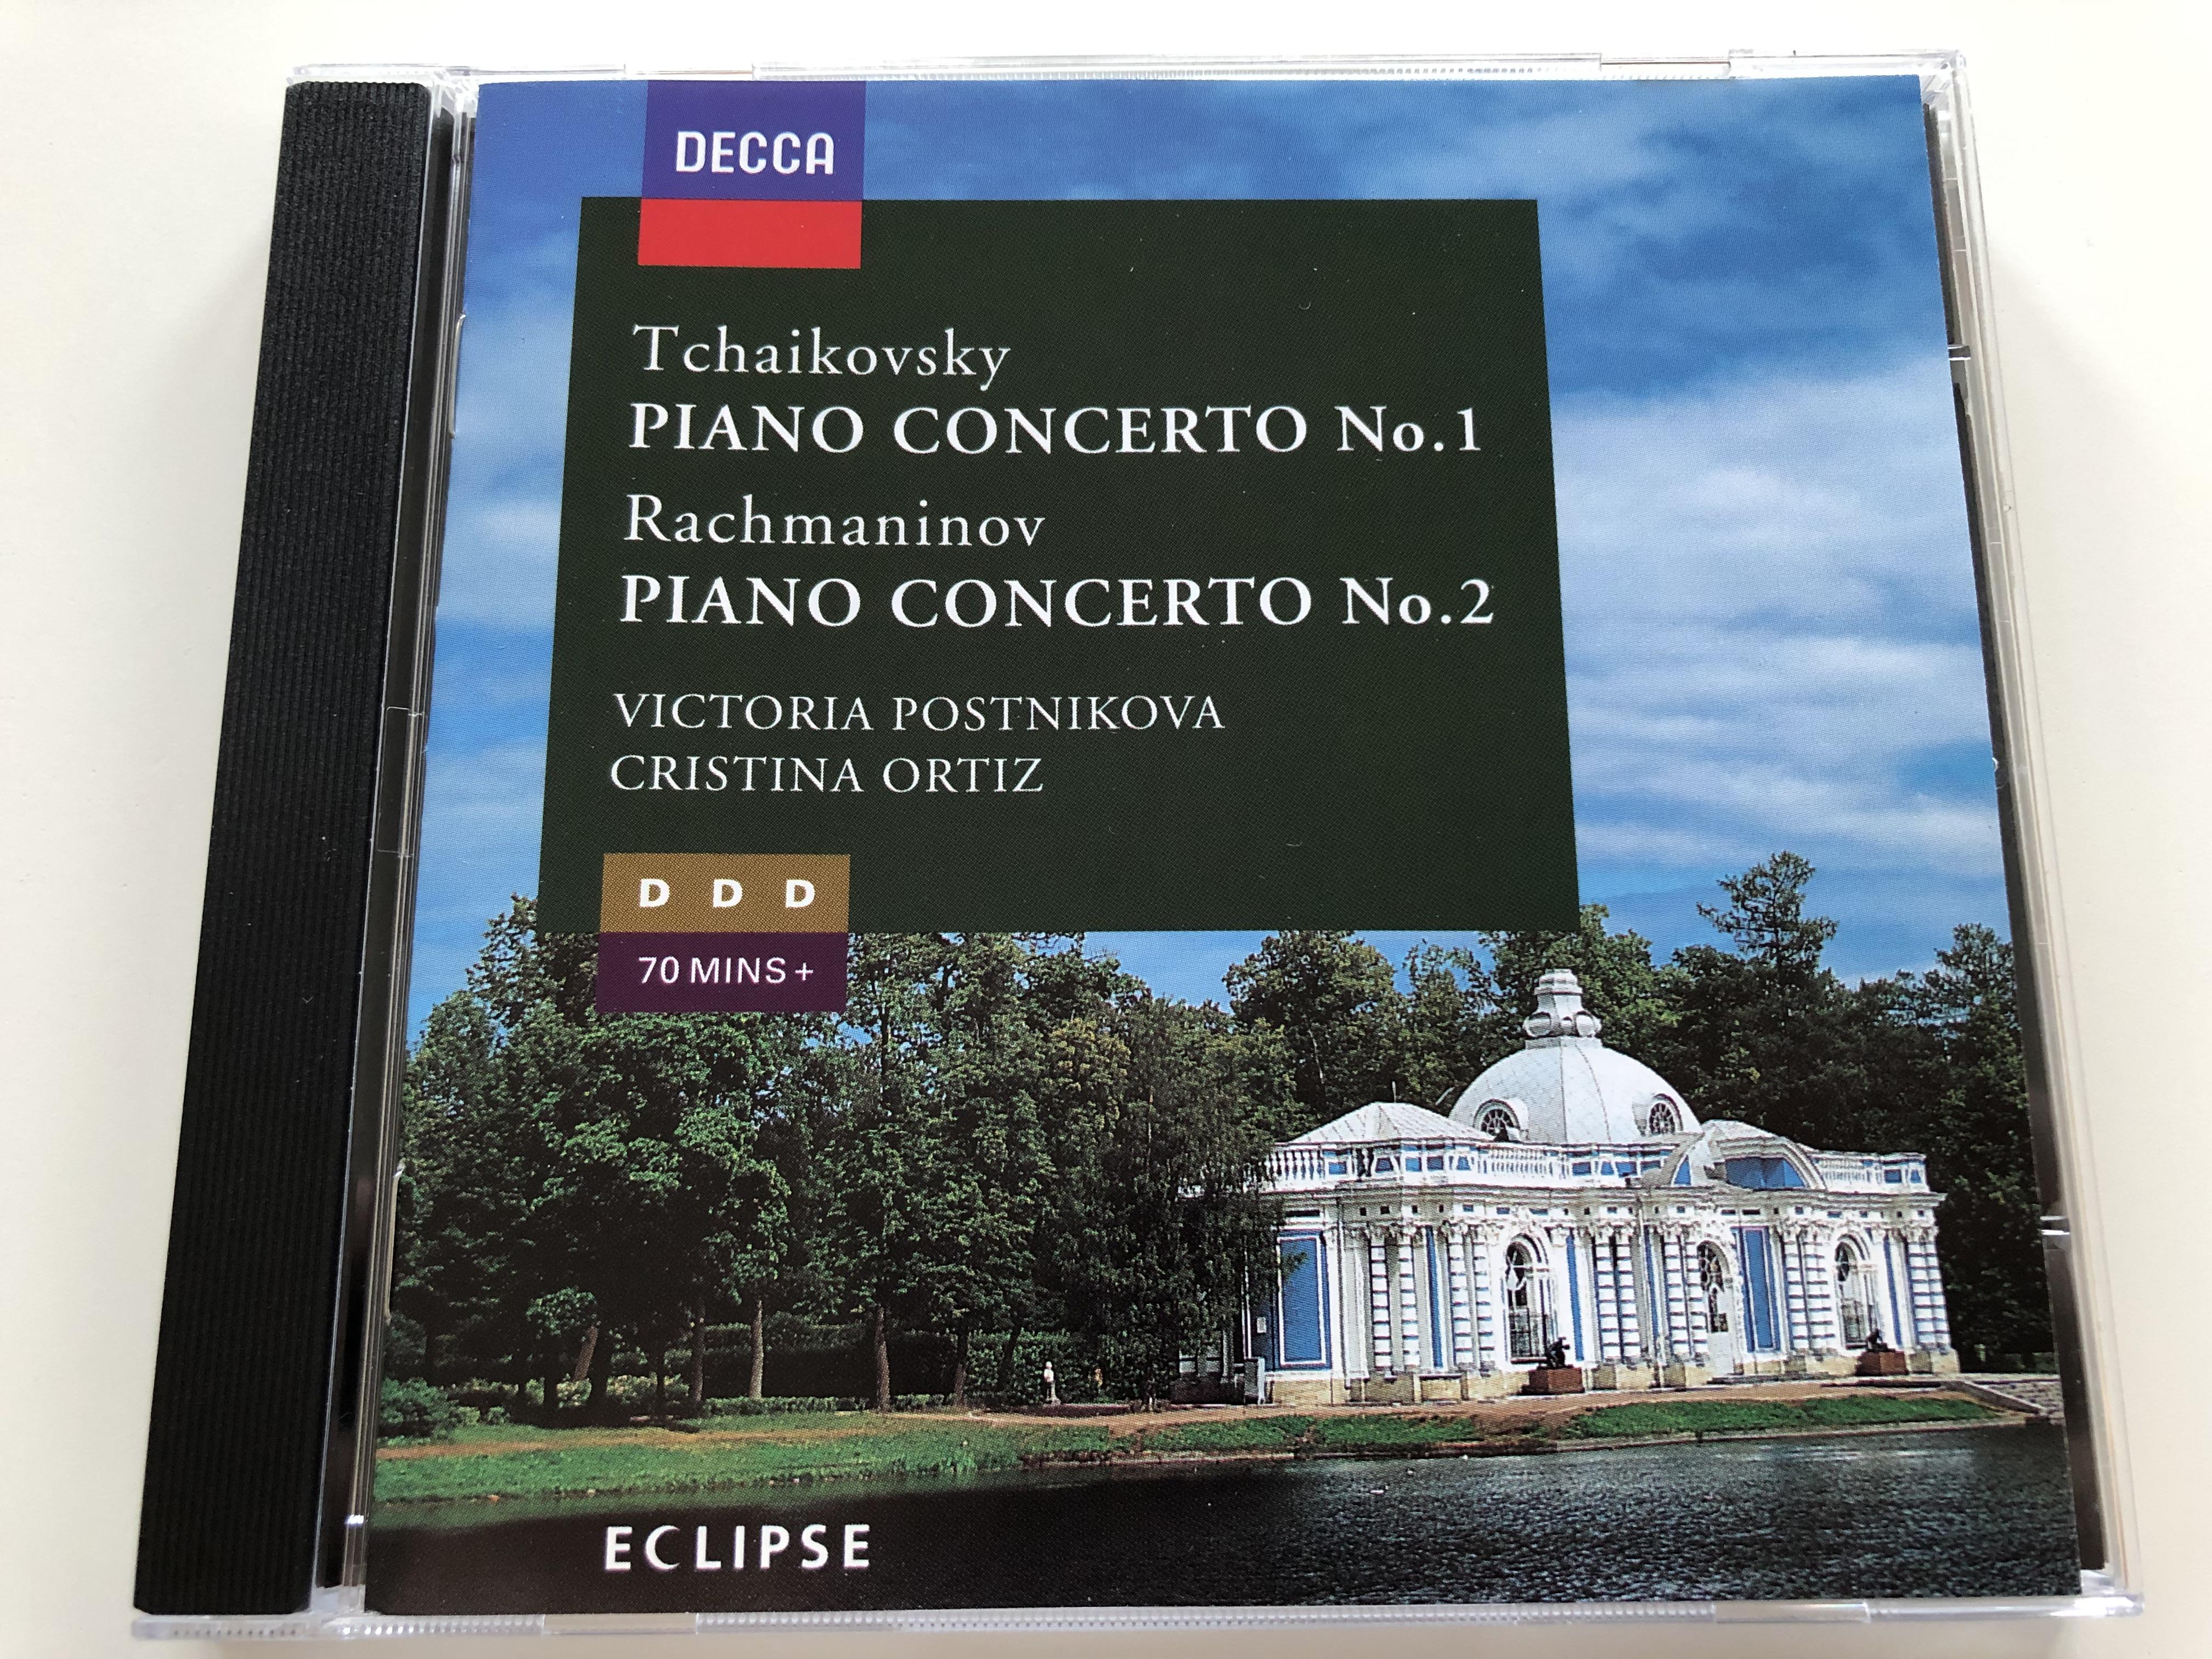 tchaikovsky-piano-concertoimg-2490.jpg